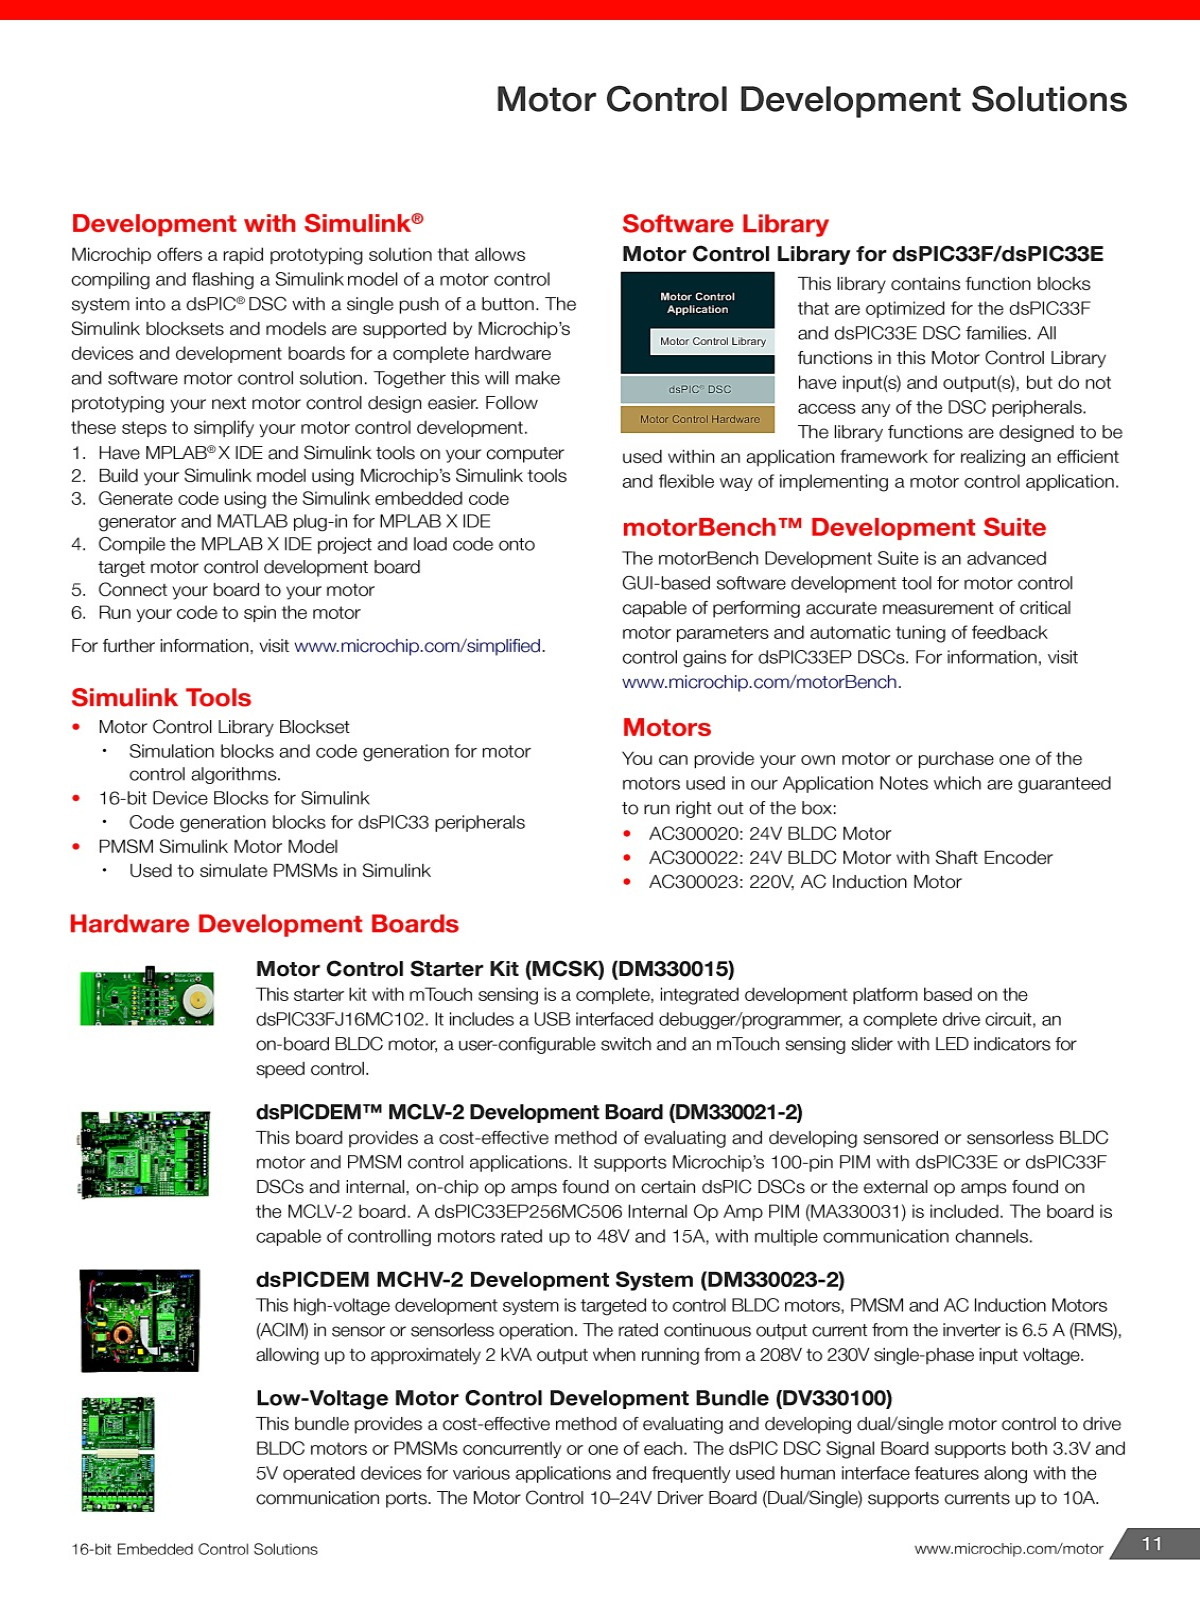 MYEBOOK - Microchip - 16-bit Embedded Control Solutions